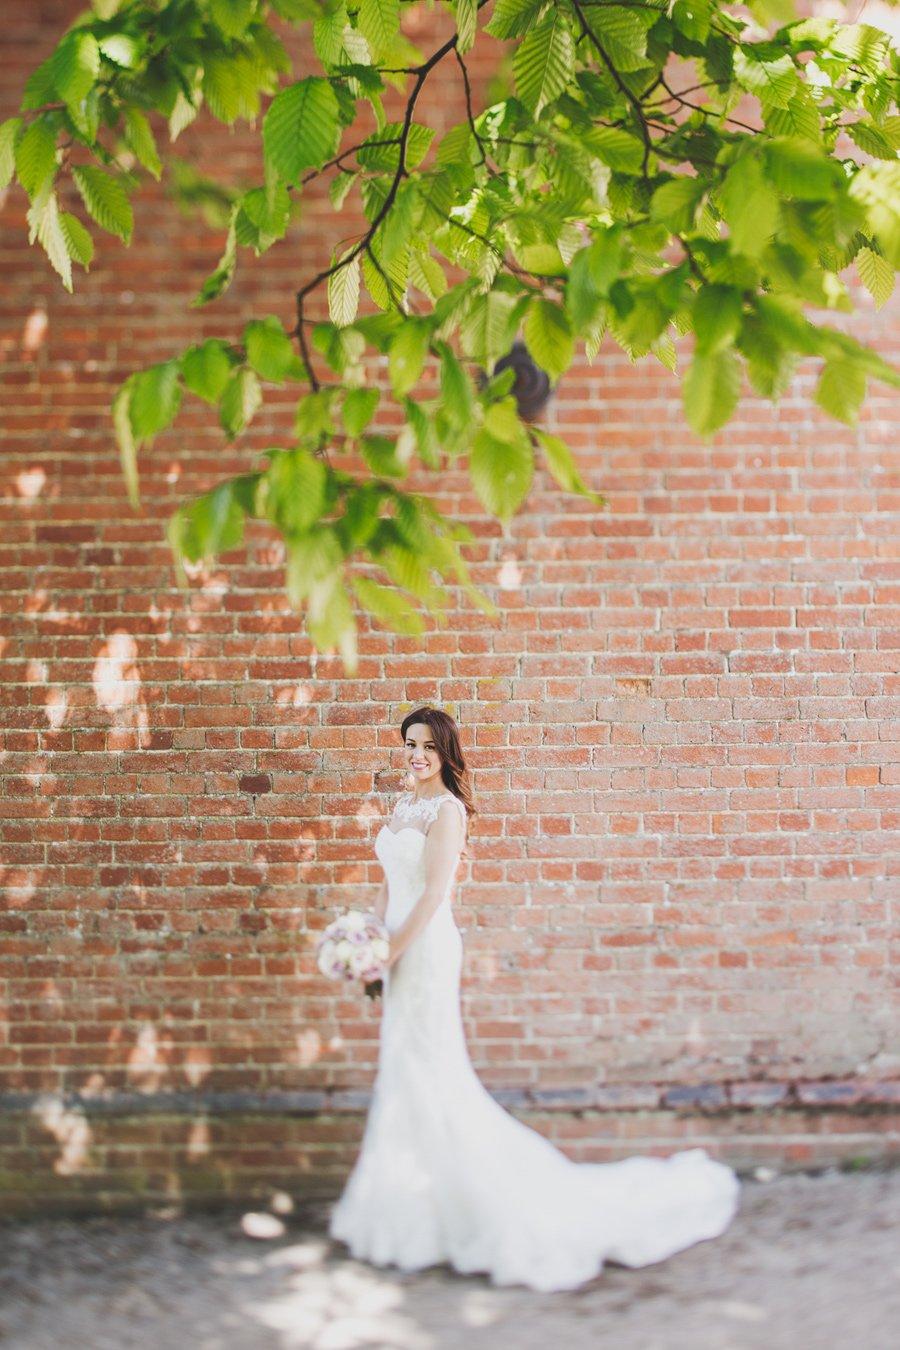 Bury-Court-Wedding-Photography-Julia-and-Anuar-Fazackarley-77